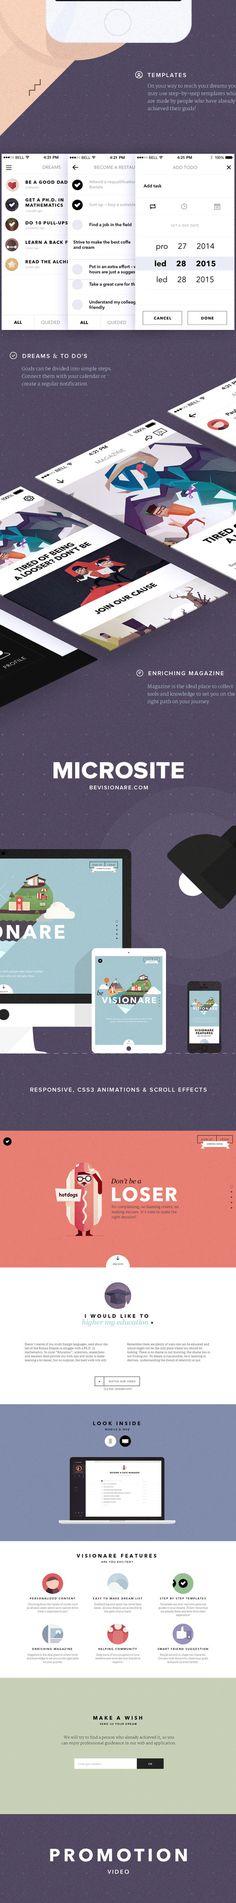 Visionare IOS Mobile App on Behance #app #presentation